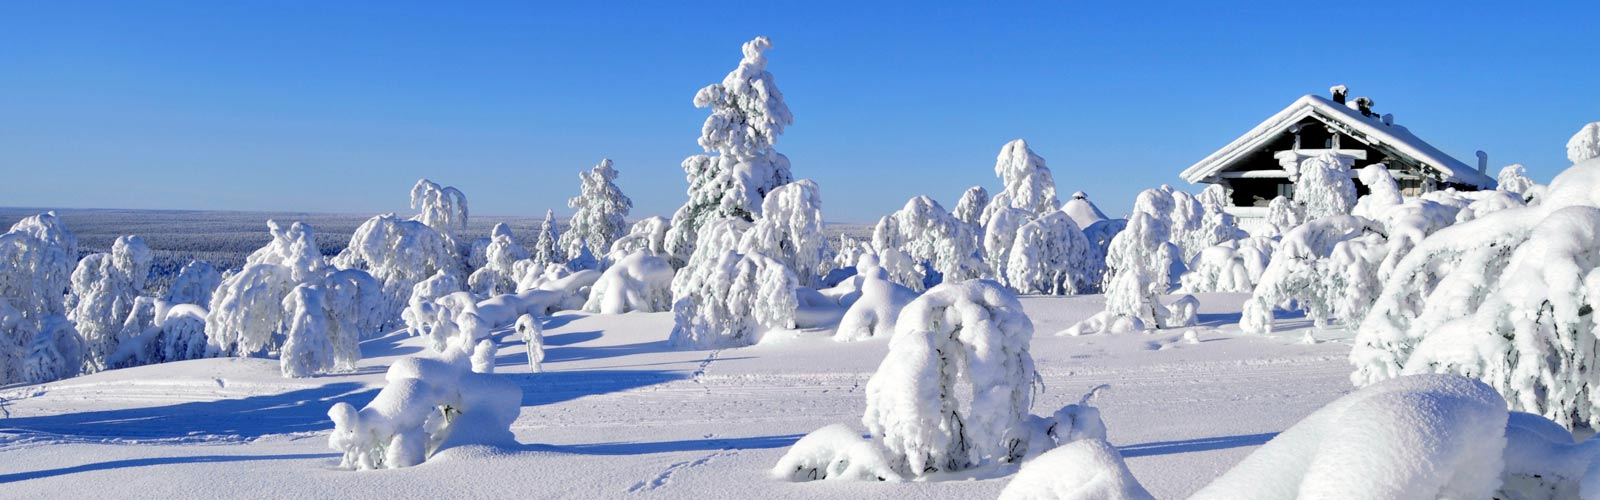 Viaje a Laponia. 5 Dic.